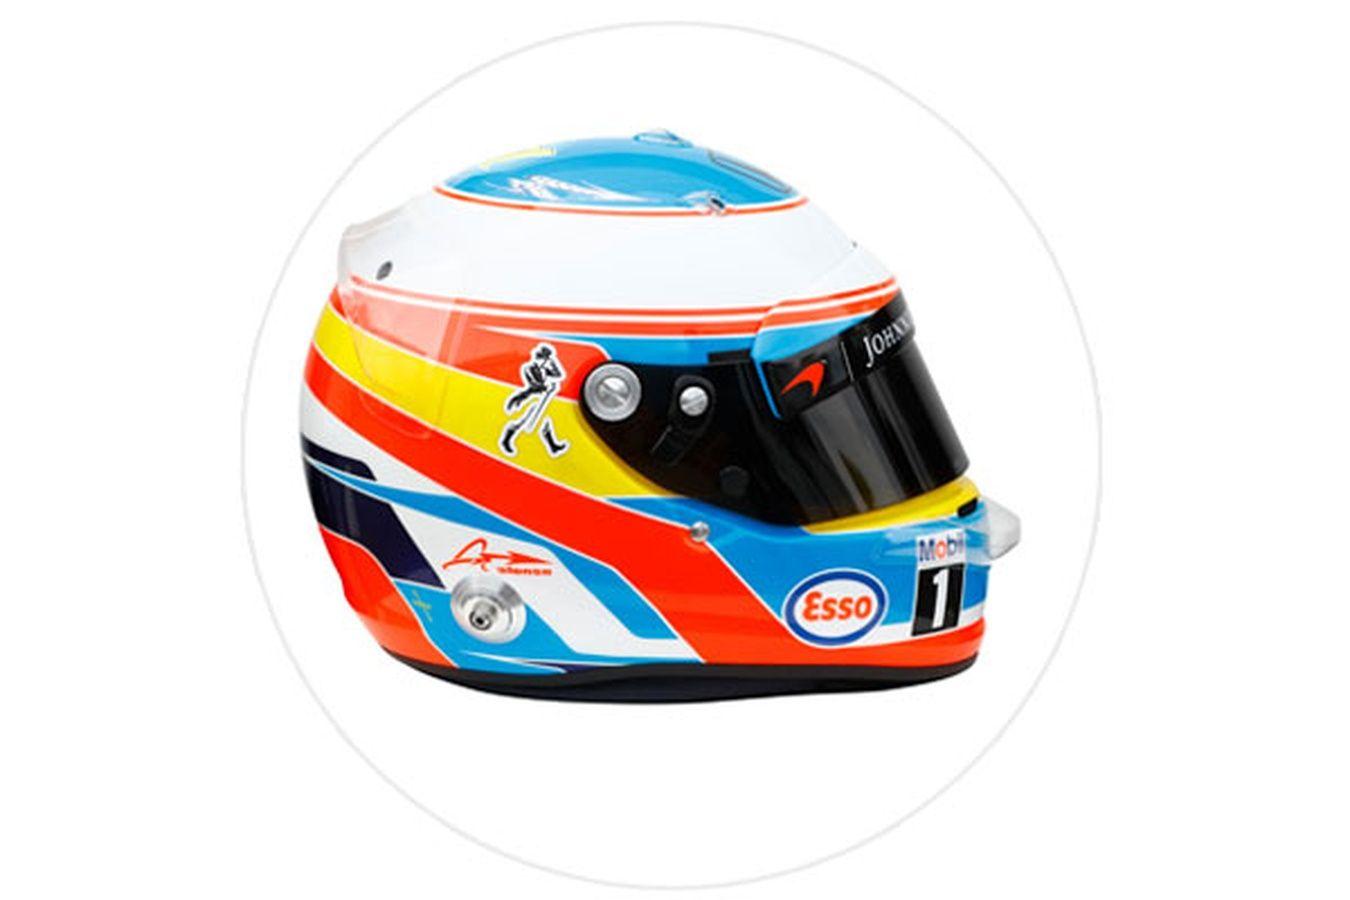 Mclaren formula australian grand prix preview cascos